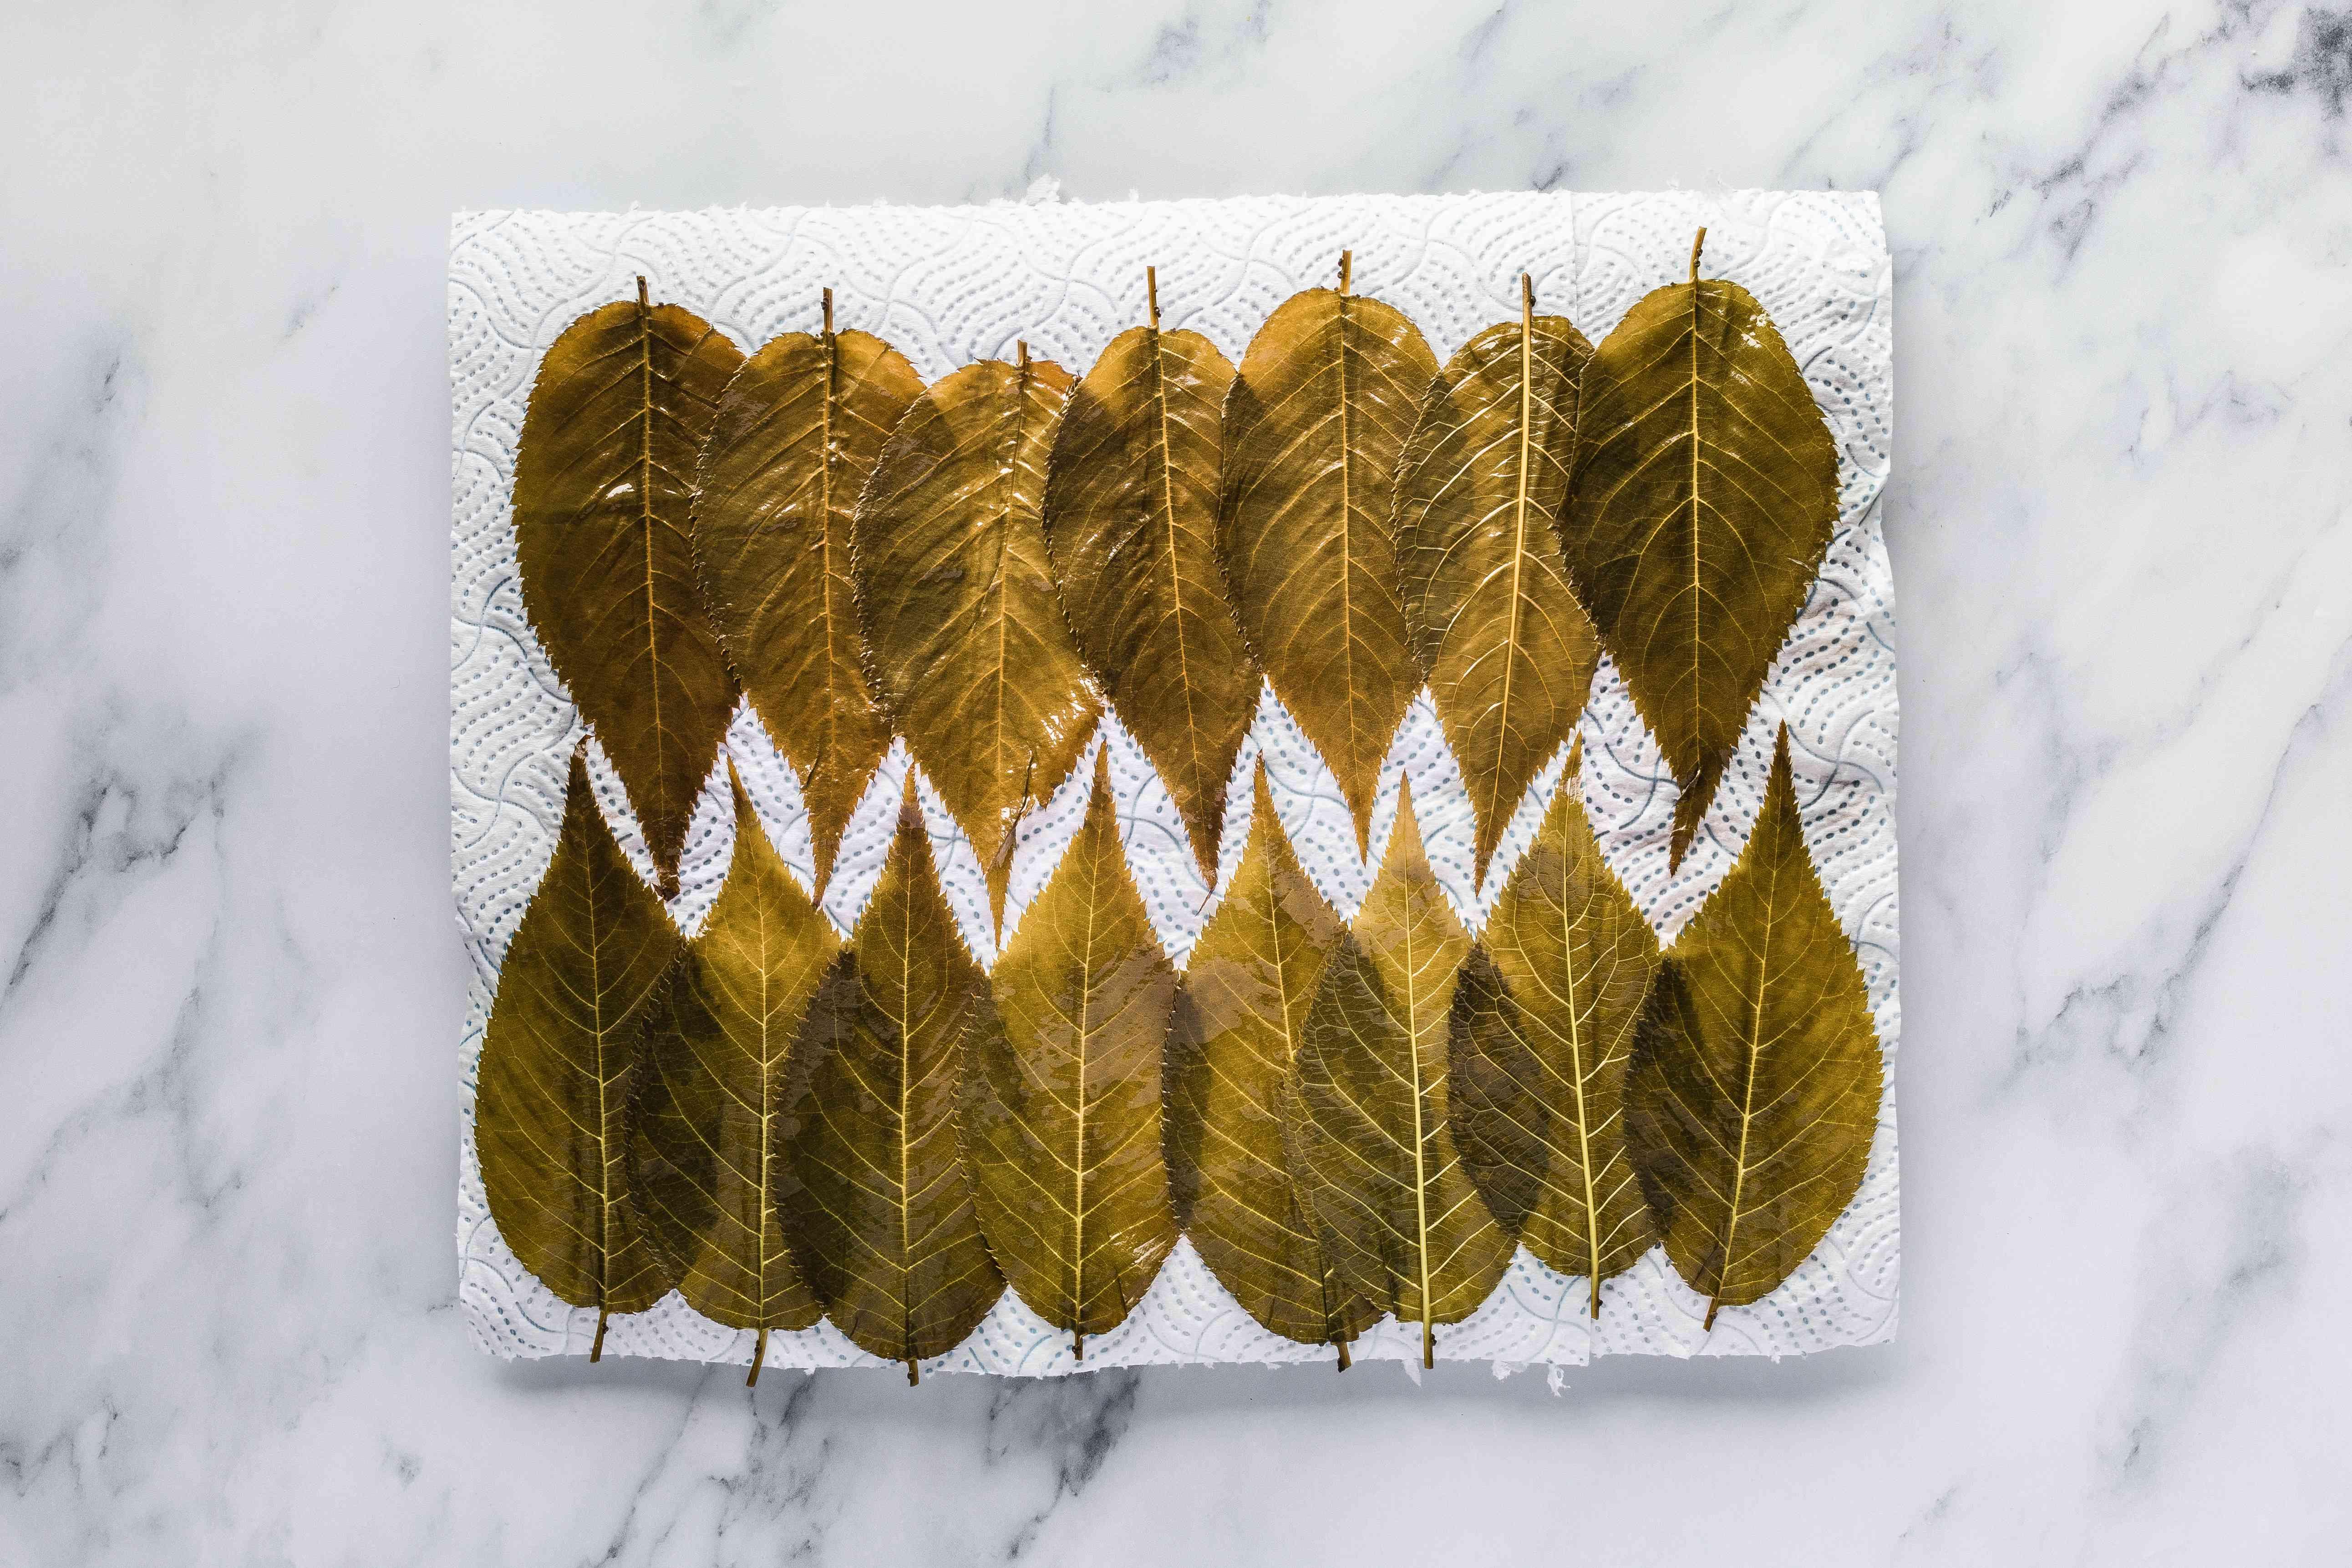 Drain leaves